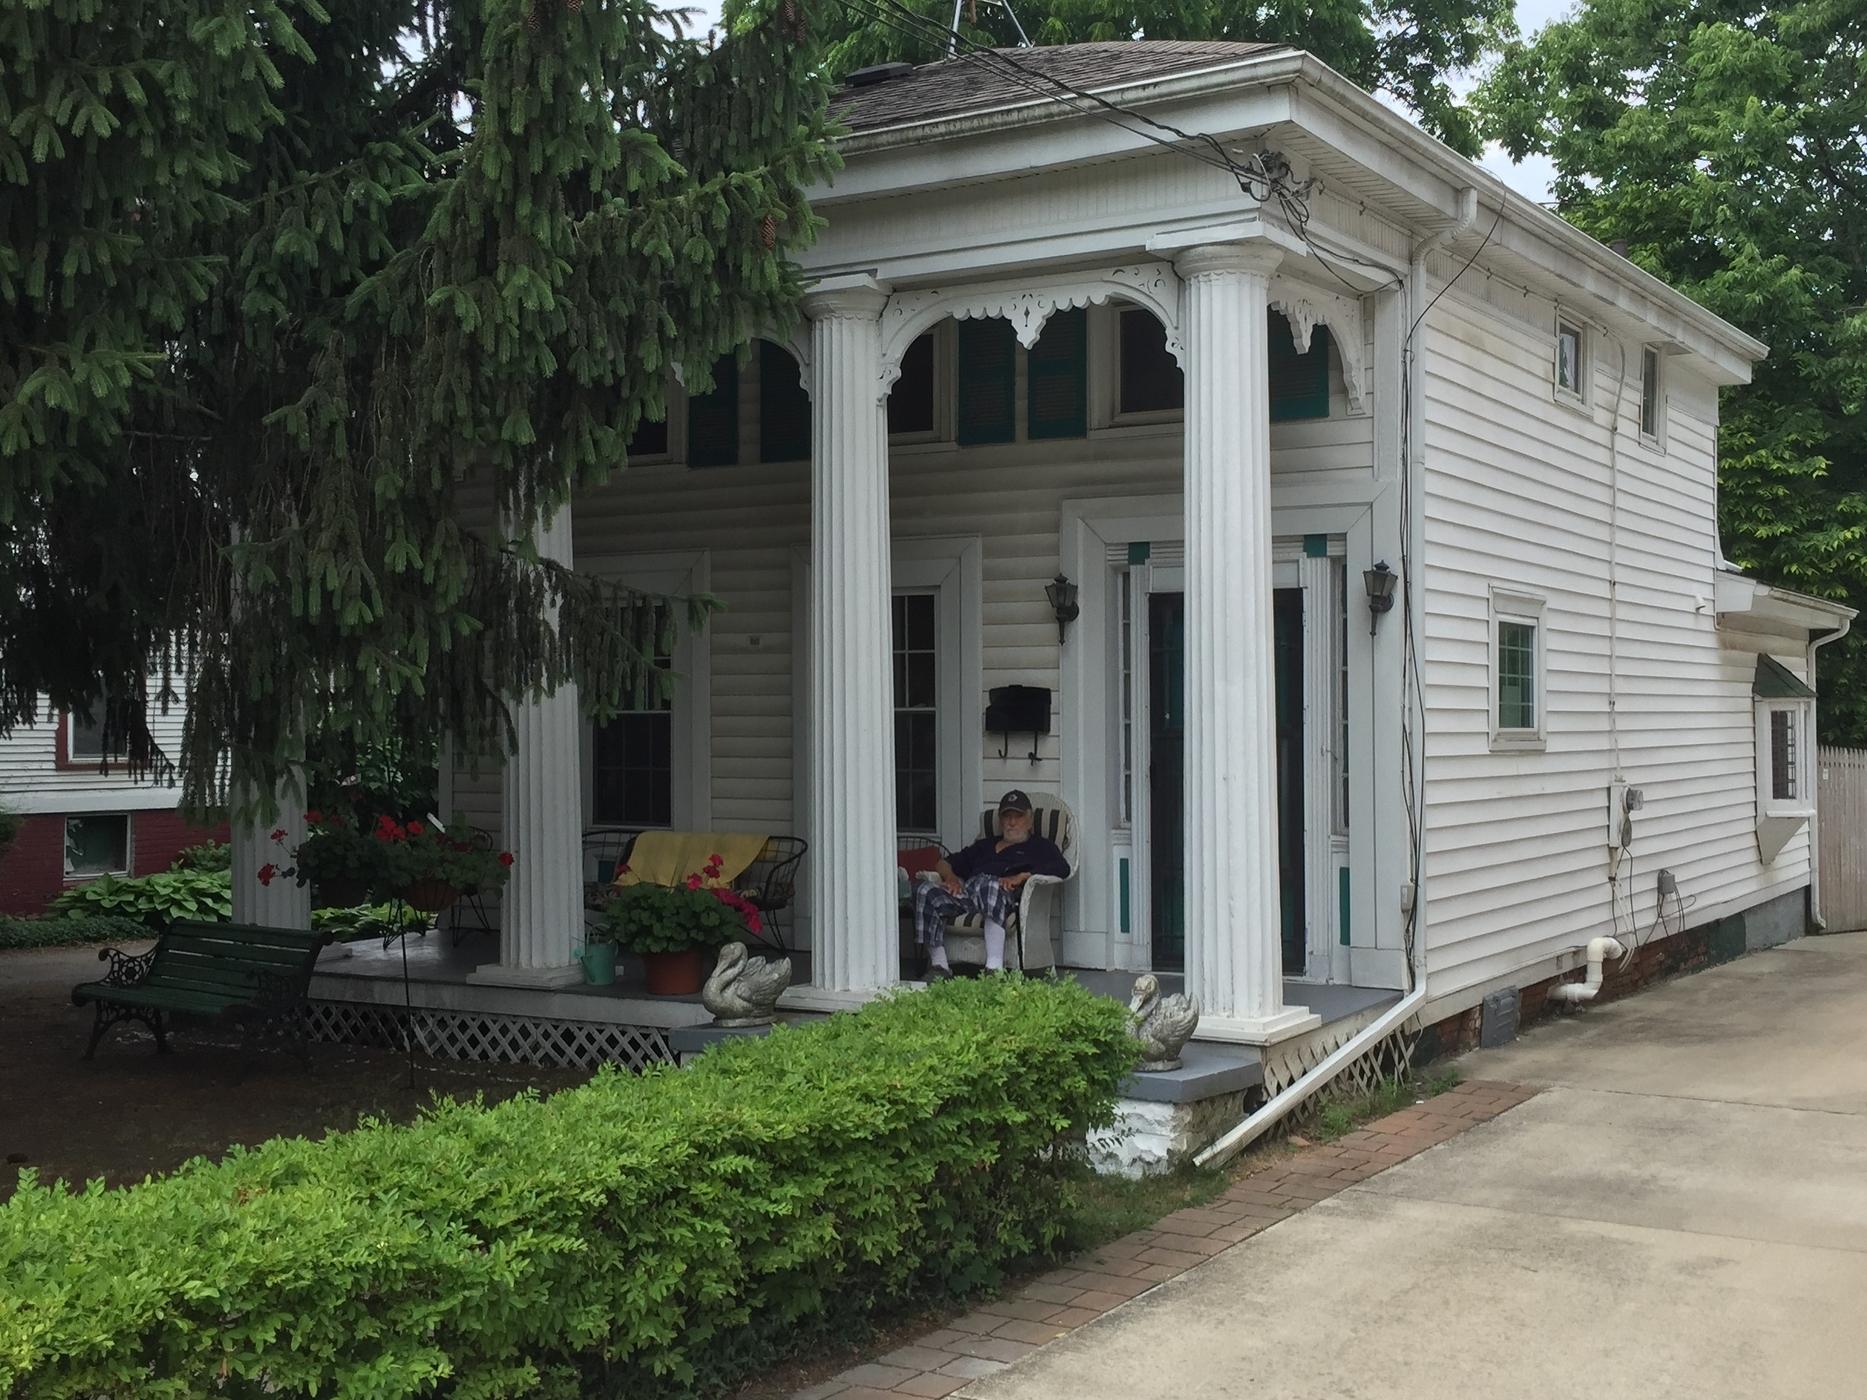 Merrick House, 458 South Main Street, 1853